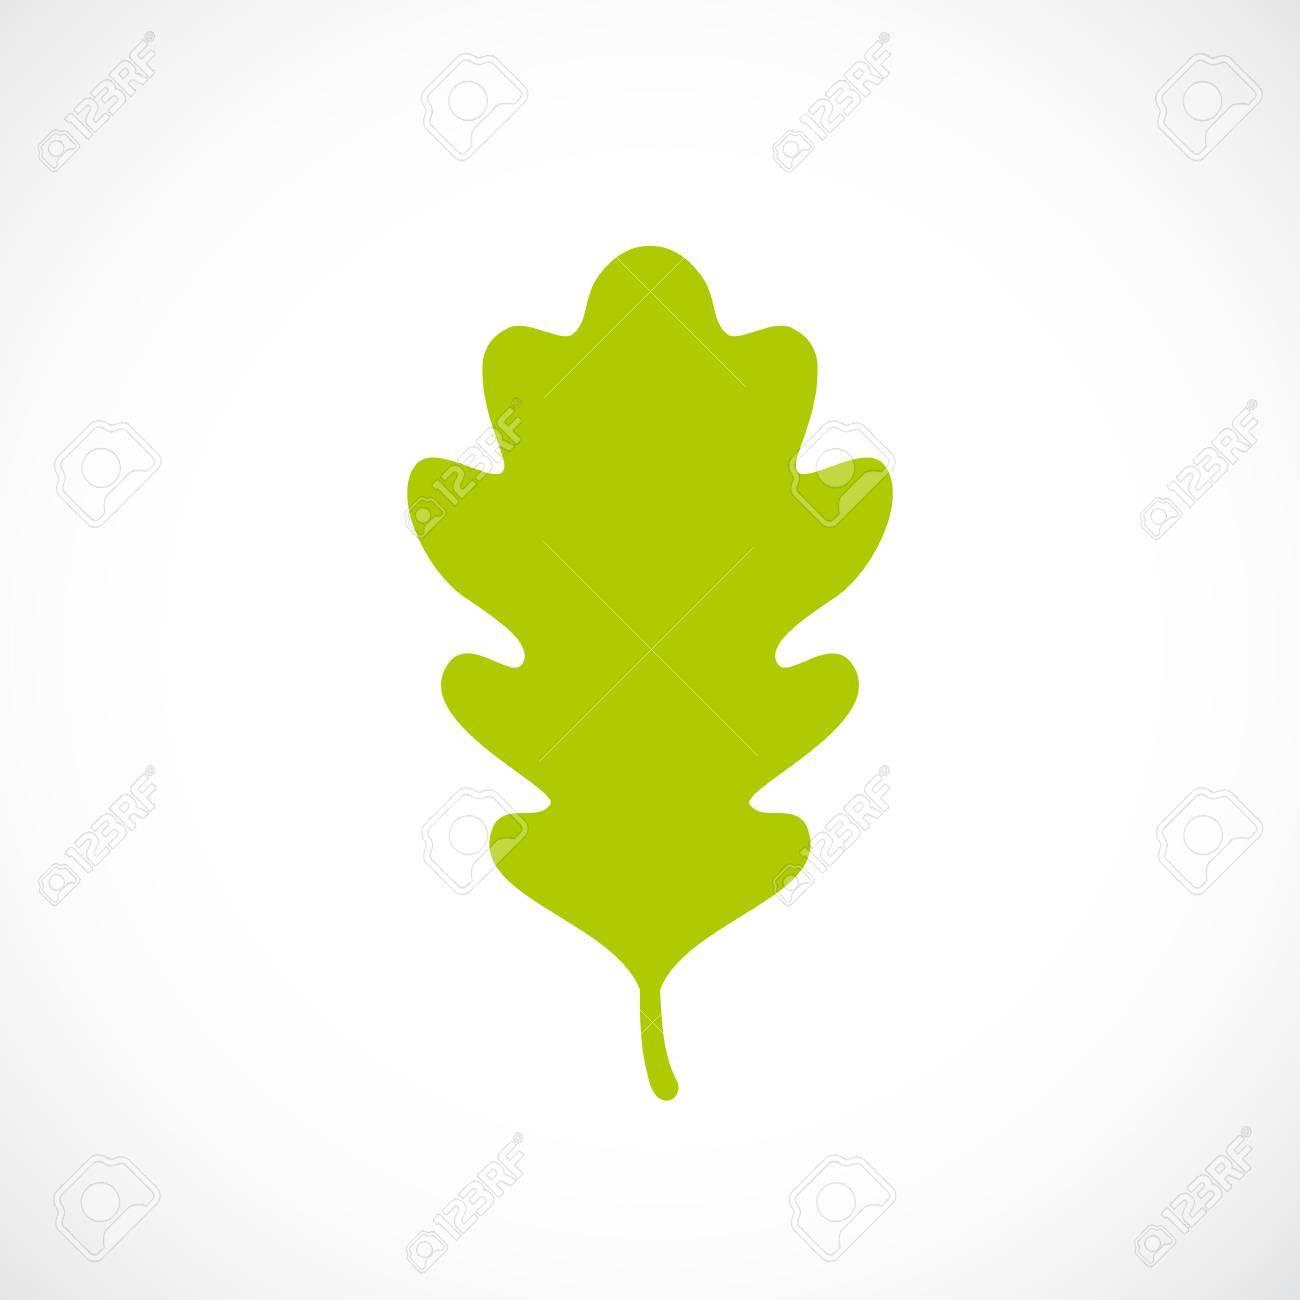 green fresh oak leaf icon royalty free cliparts vectors and stock rh 123rf com oak tree leaf vector oak leaf vector free download